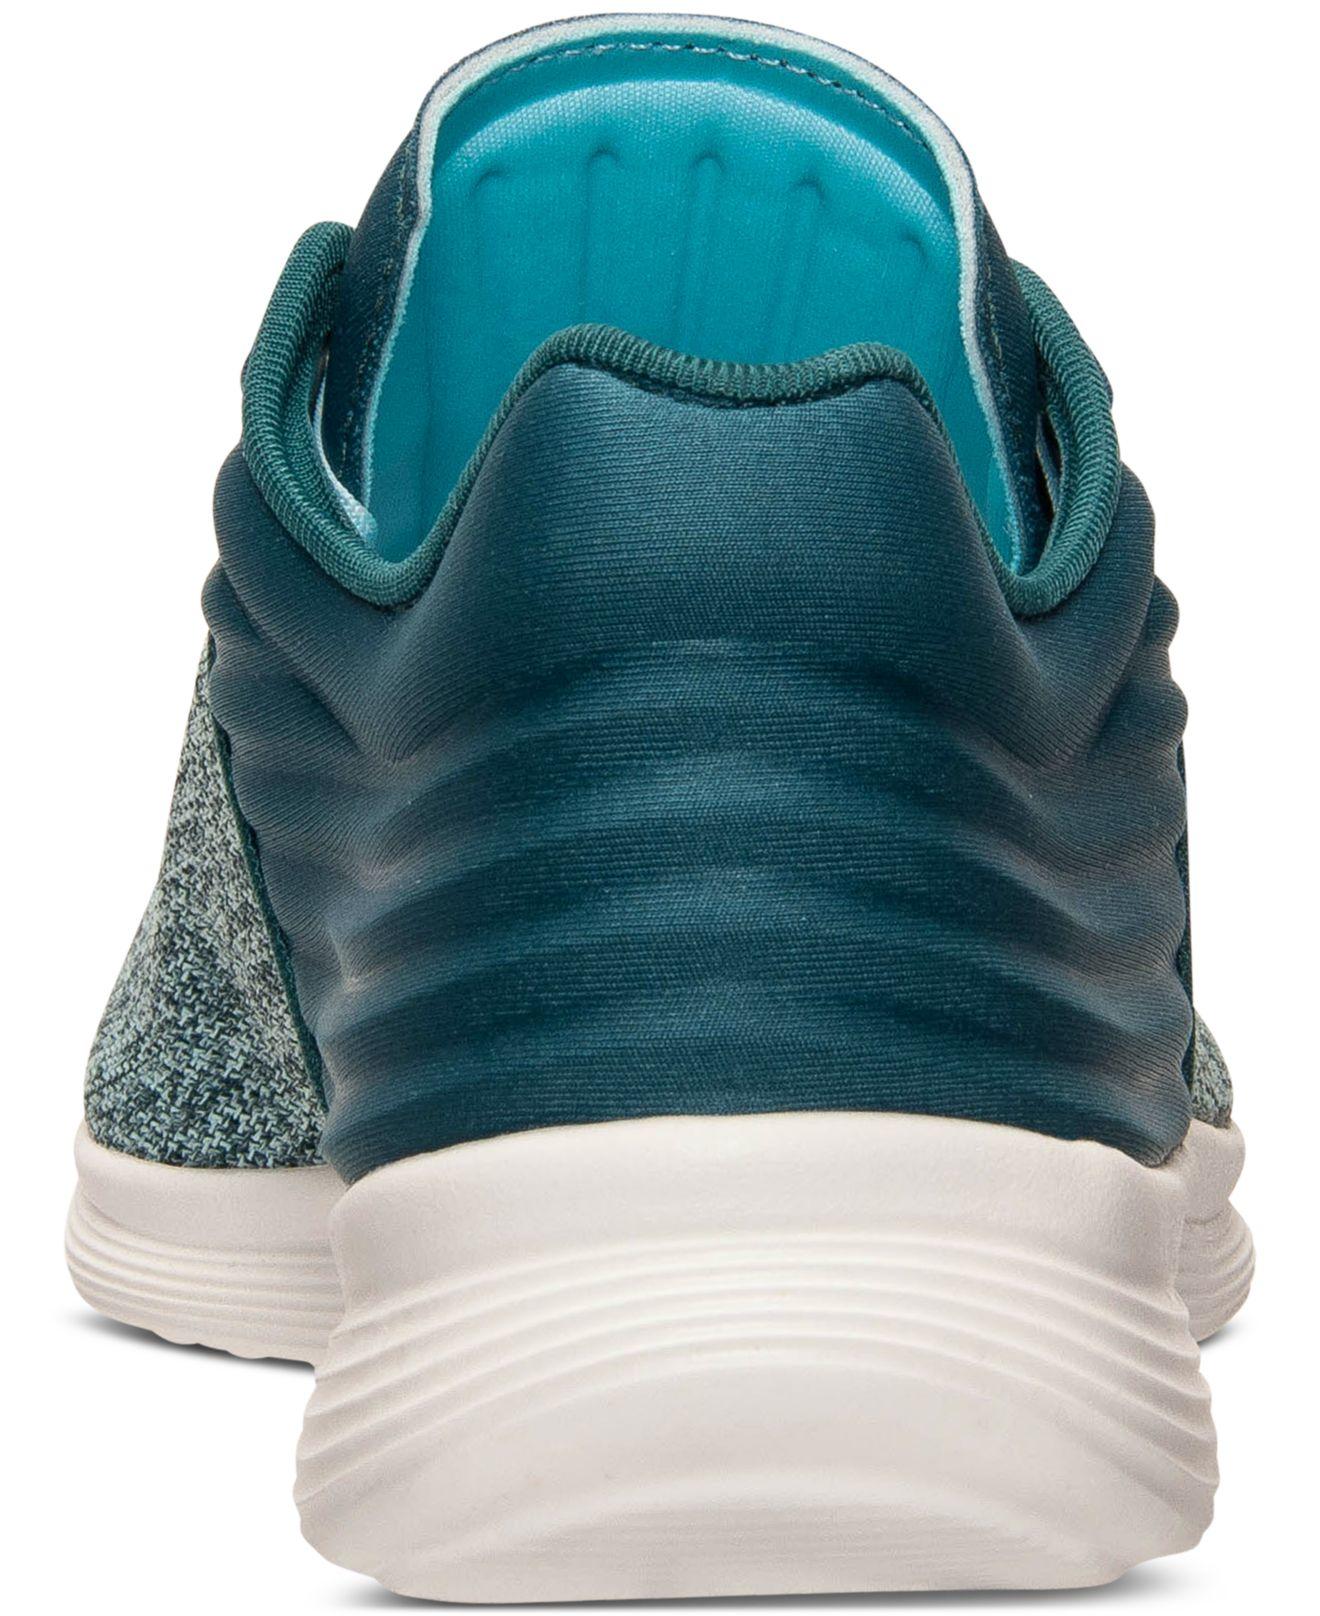 740a666c3a5 Lyst - Reebok Women s Skyscape Fuse Walking Sneakers From Finish ...